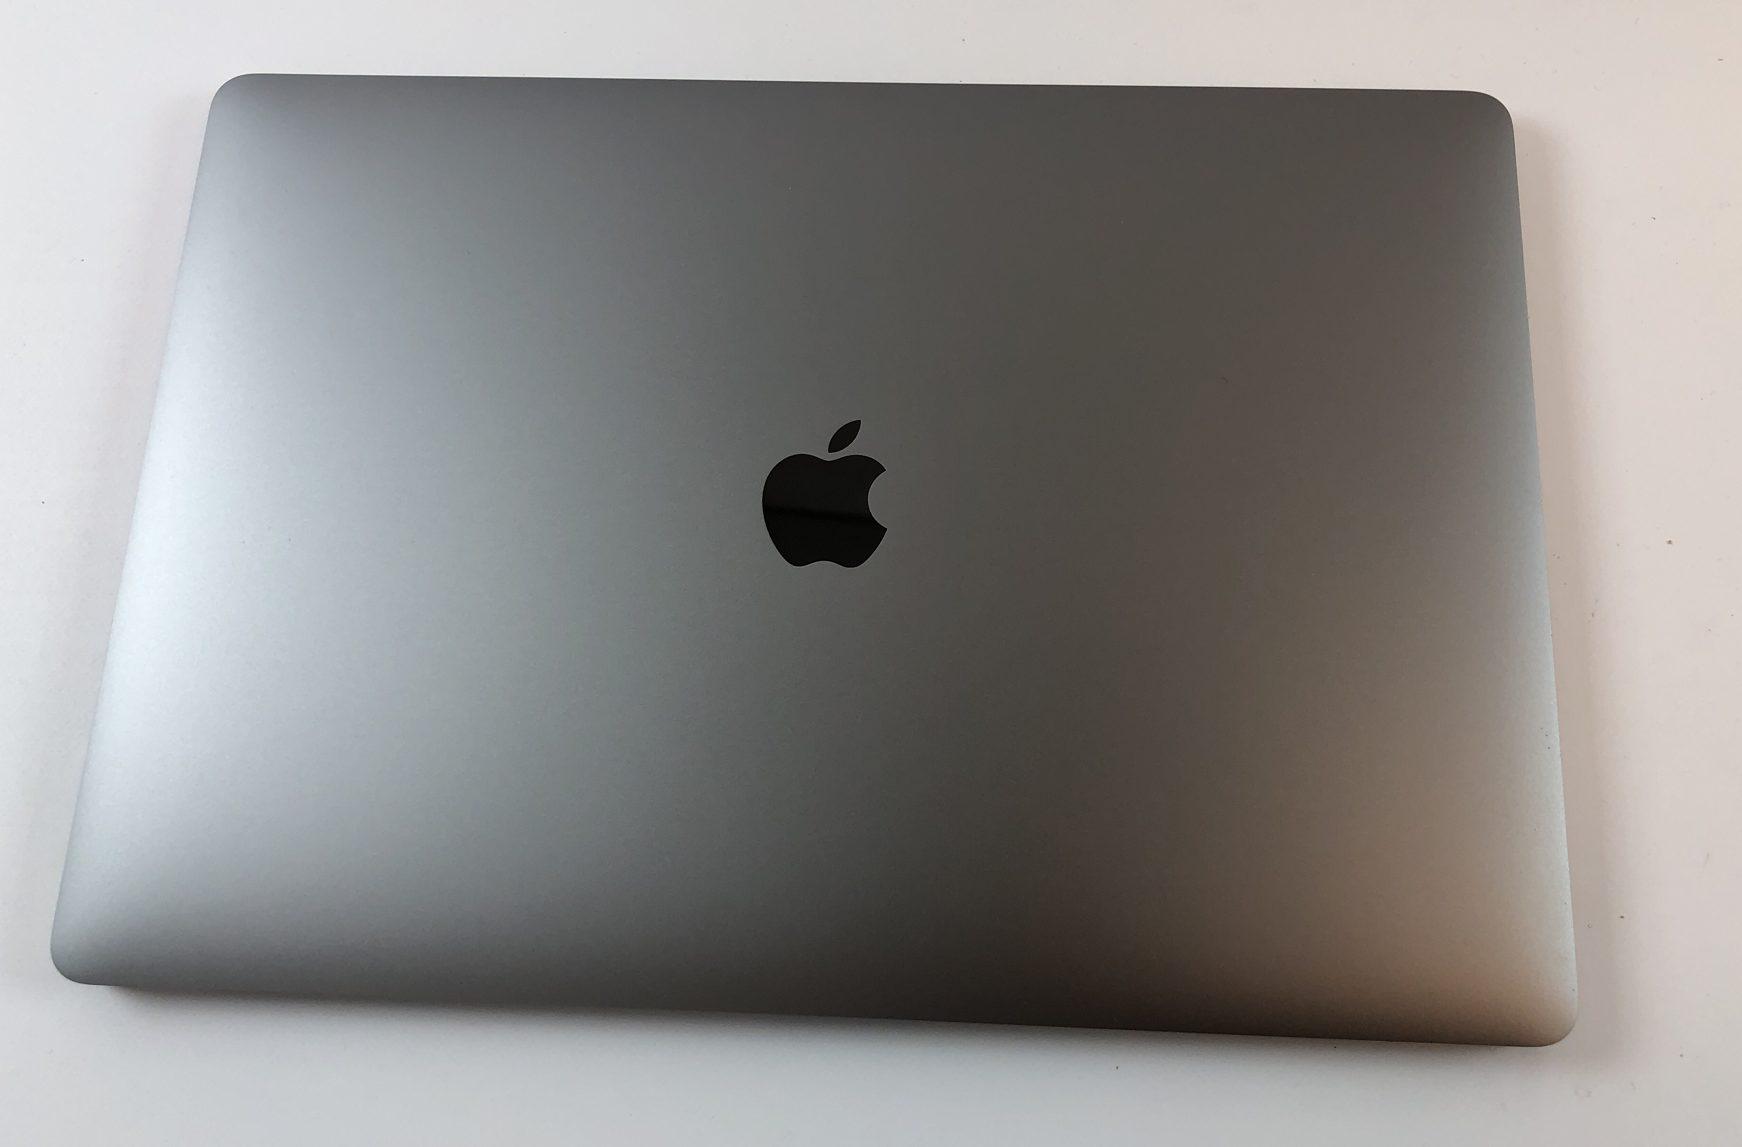 "MacBook Pro 15"" Touch Bar Mid 2017 (Intel Quad-Core i7 2.9 GHz 16 GB RAM 512 GB SSD), Space Gray, Intel Quad-Core i7 2.9 GHz, 16 GB RAM, 512 GB SSD, image 2"